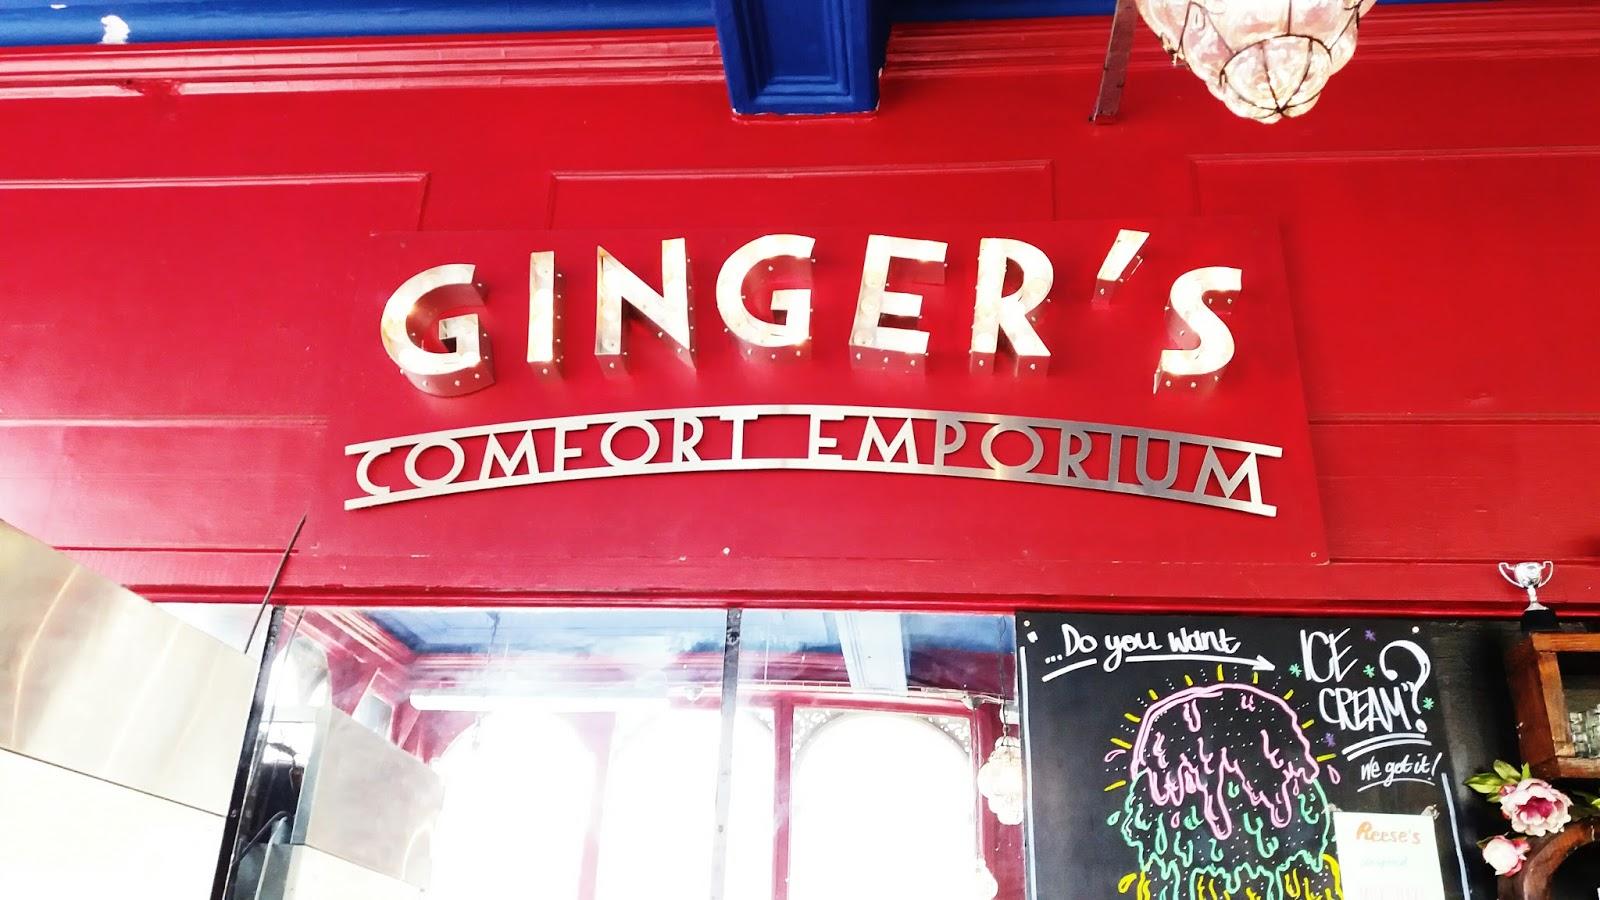 Ginger's Comfort Emporium Afflecks Palace Manchester